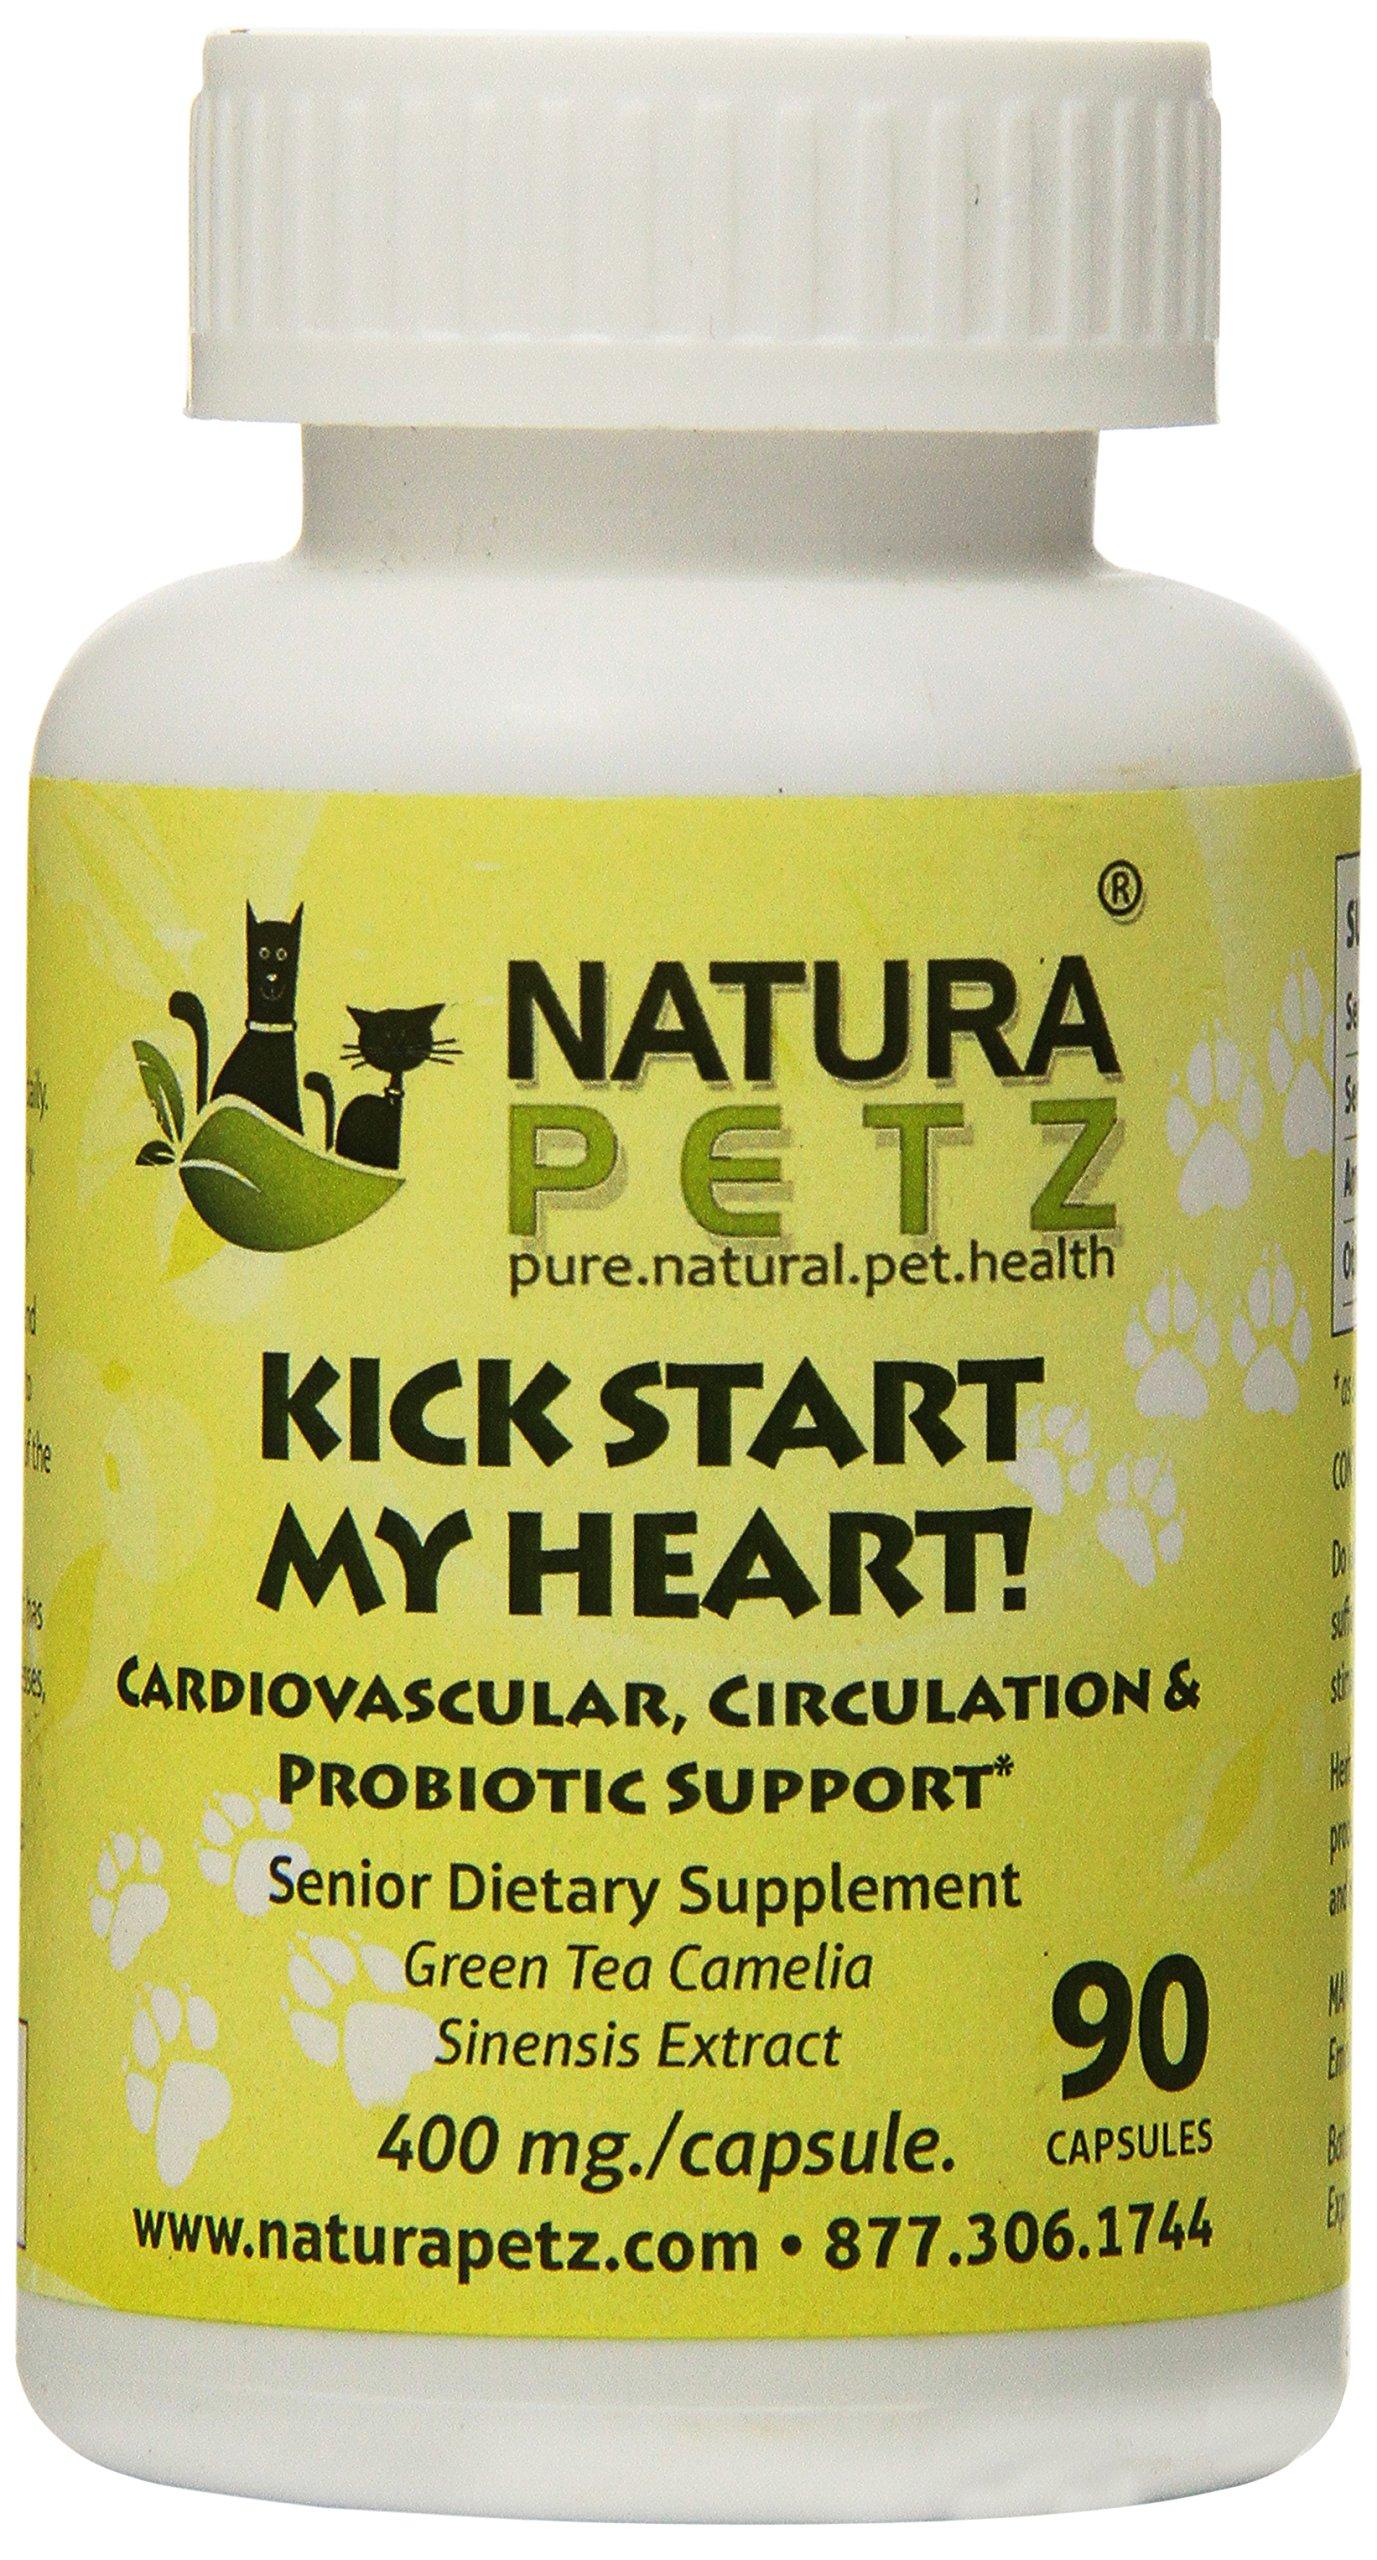 Natura Petz Kick Start My Heart Probiotic Cardiovascular and Circulation Support for Senior Pets, 90 Capsules, 400mg Per Capsule